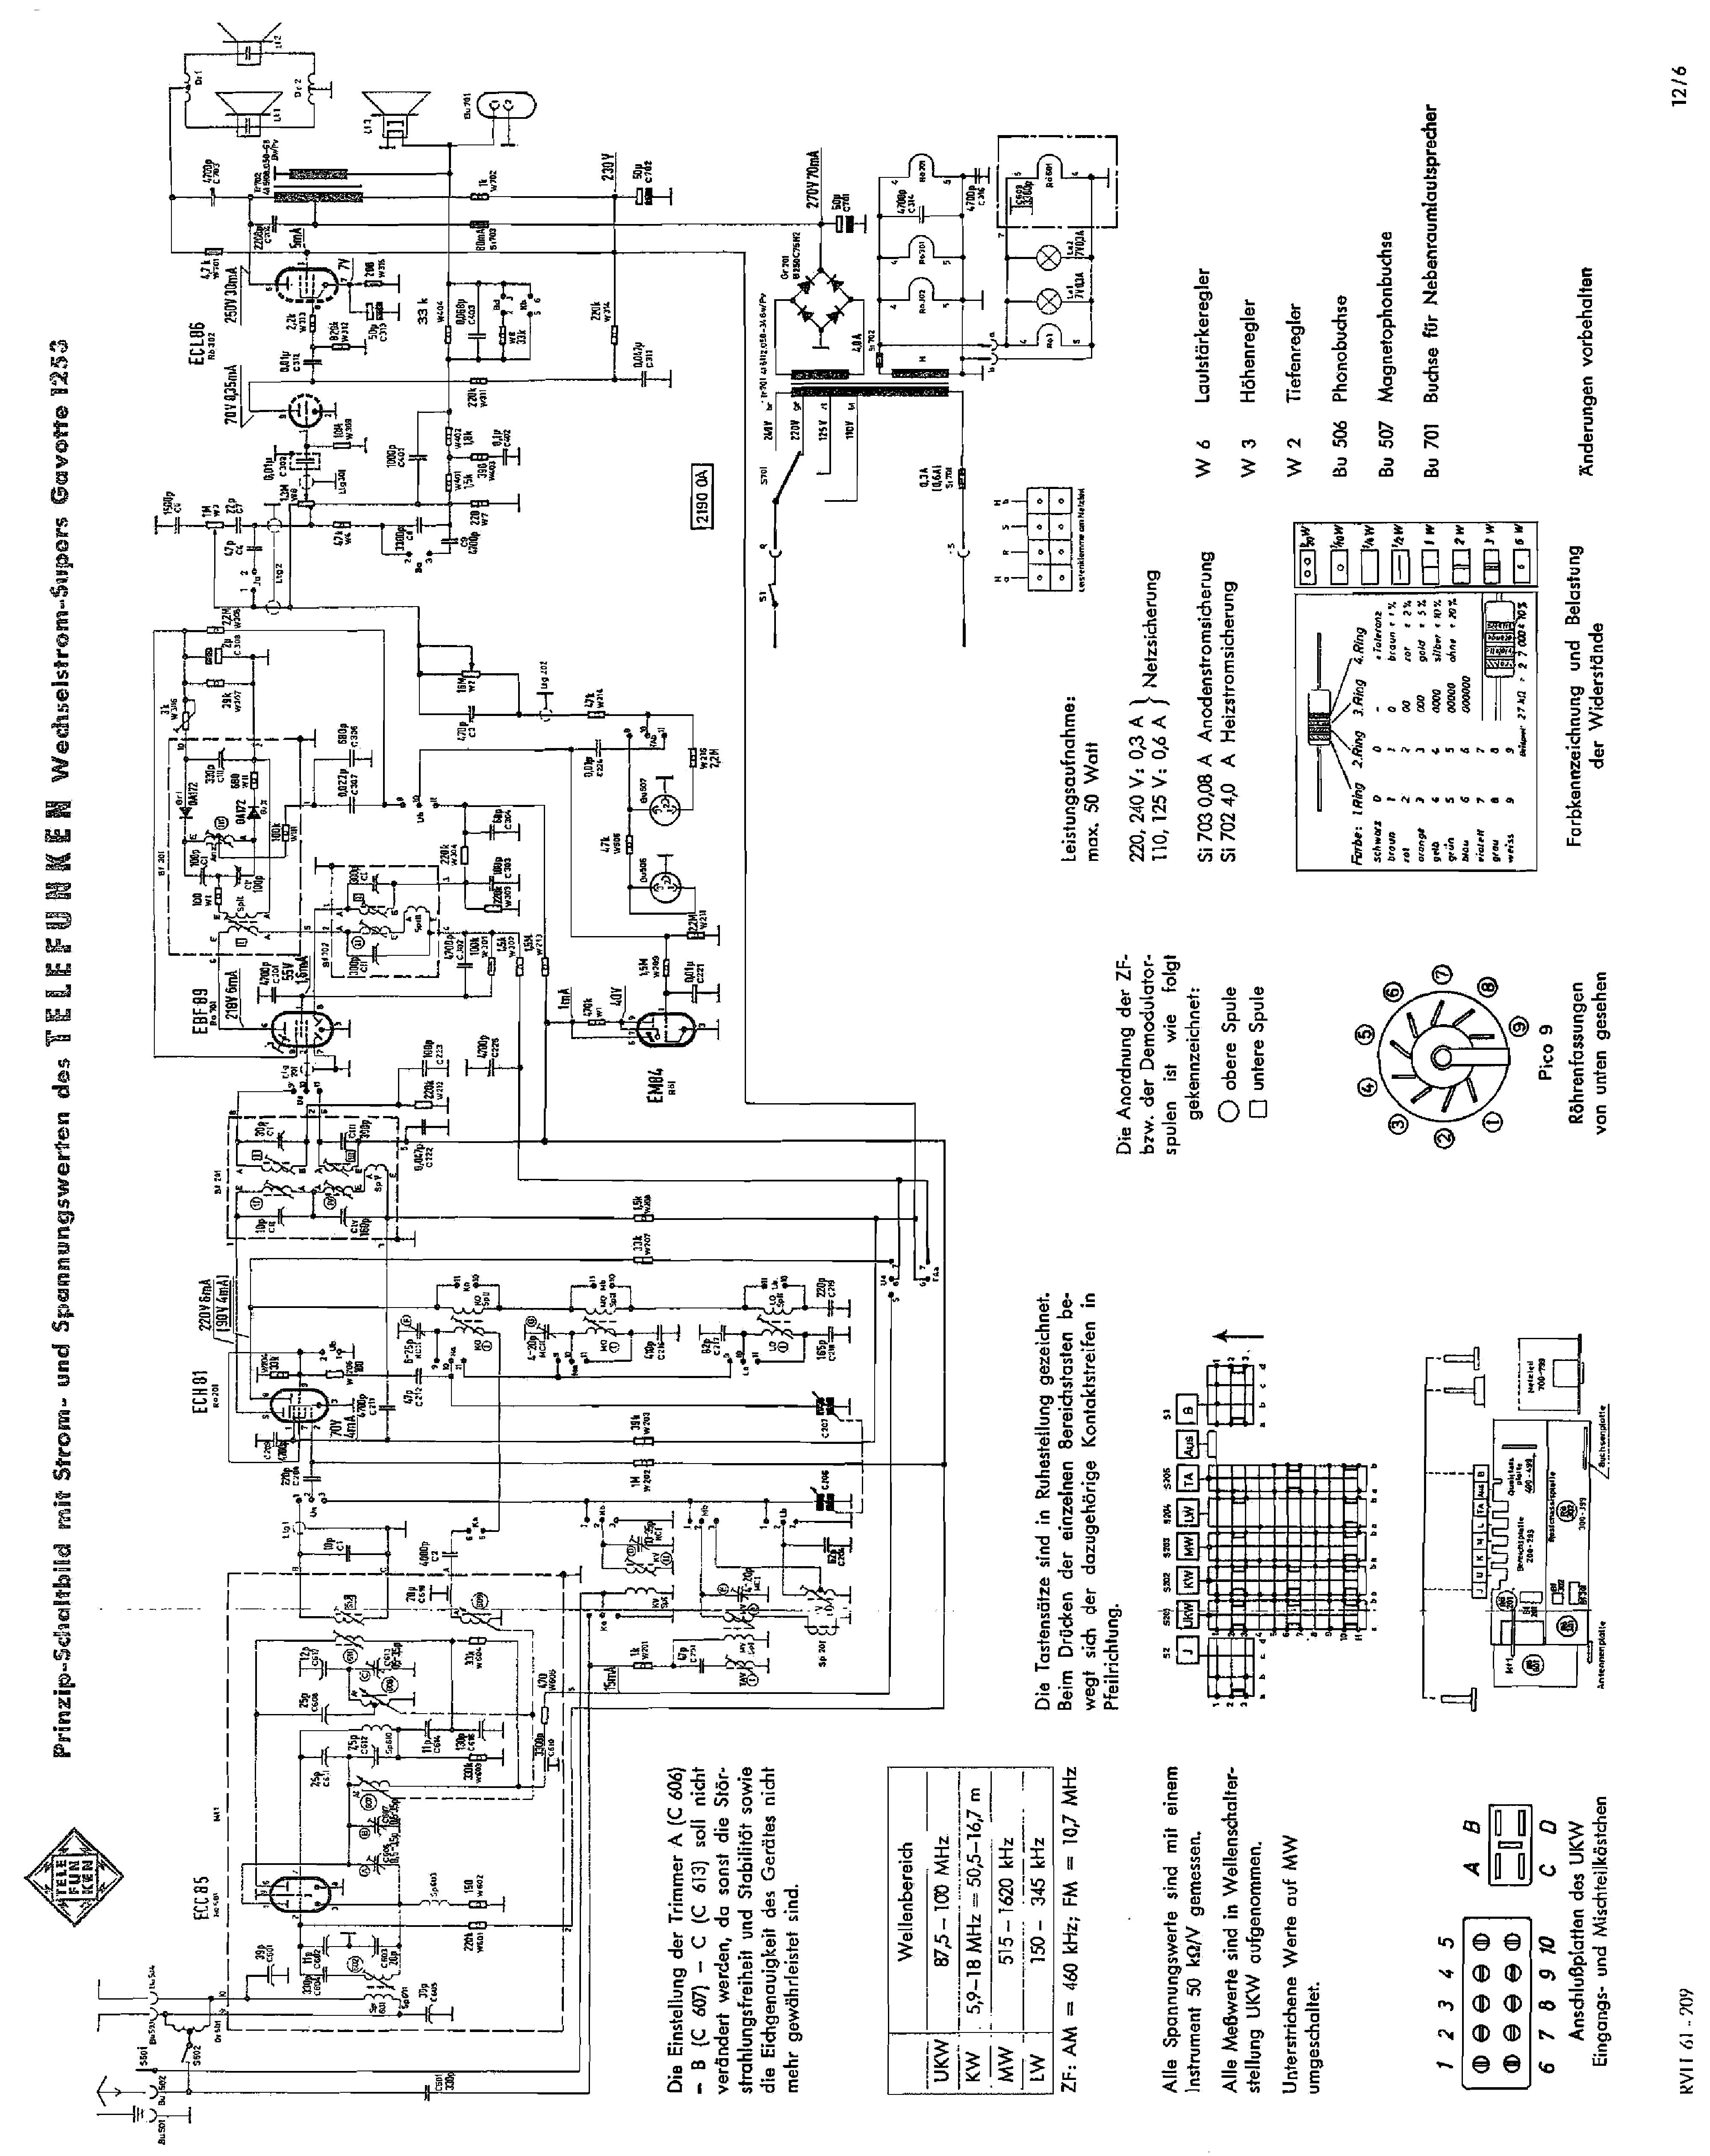 file relay rack ladder diagram